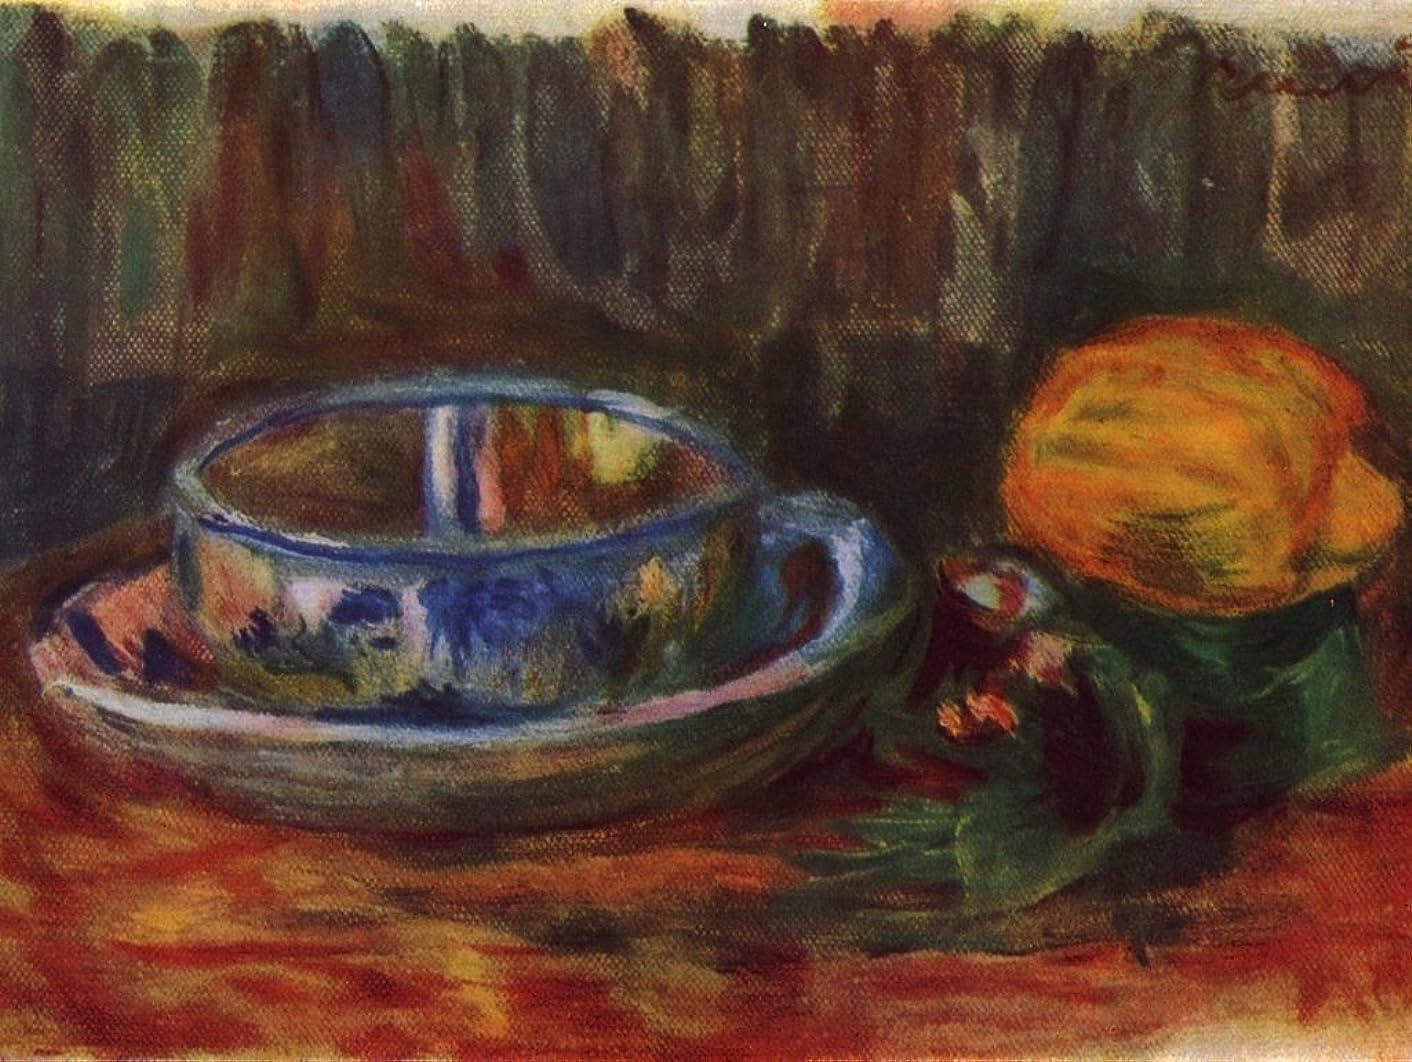 Lais Jigsaw Pierre-Auguste Renoir - Still Life with Cup 500 Pieces